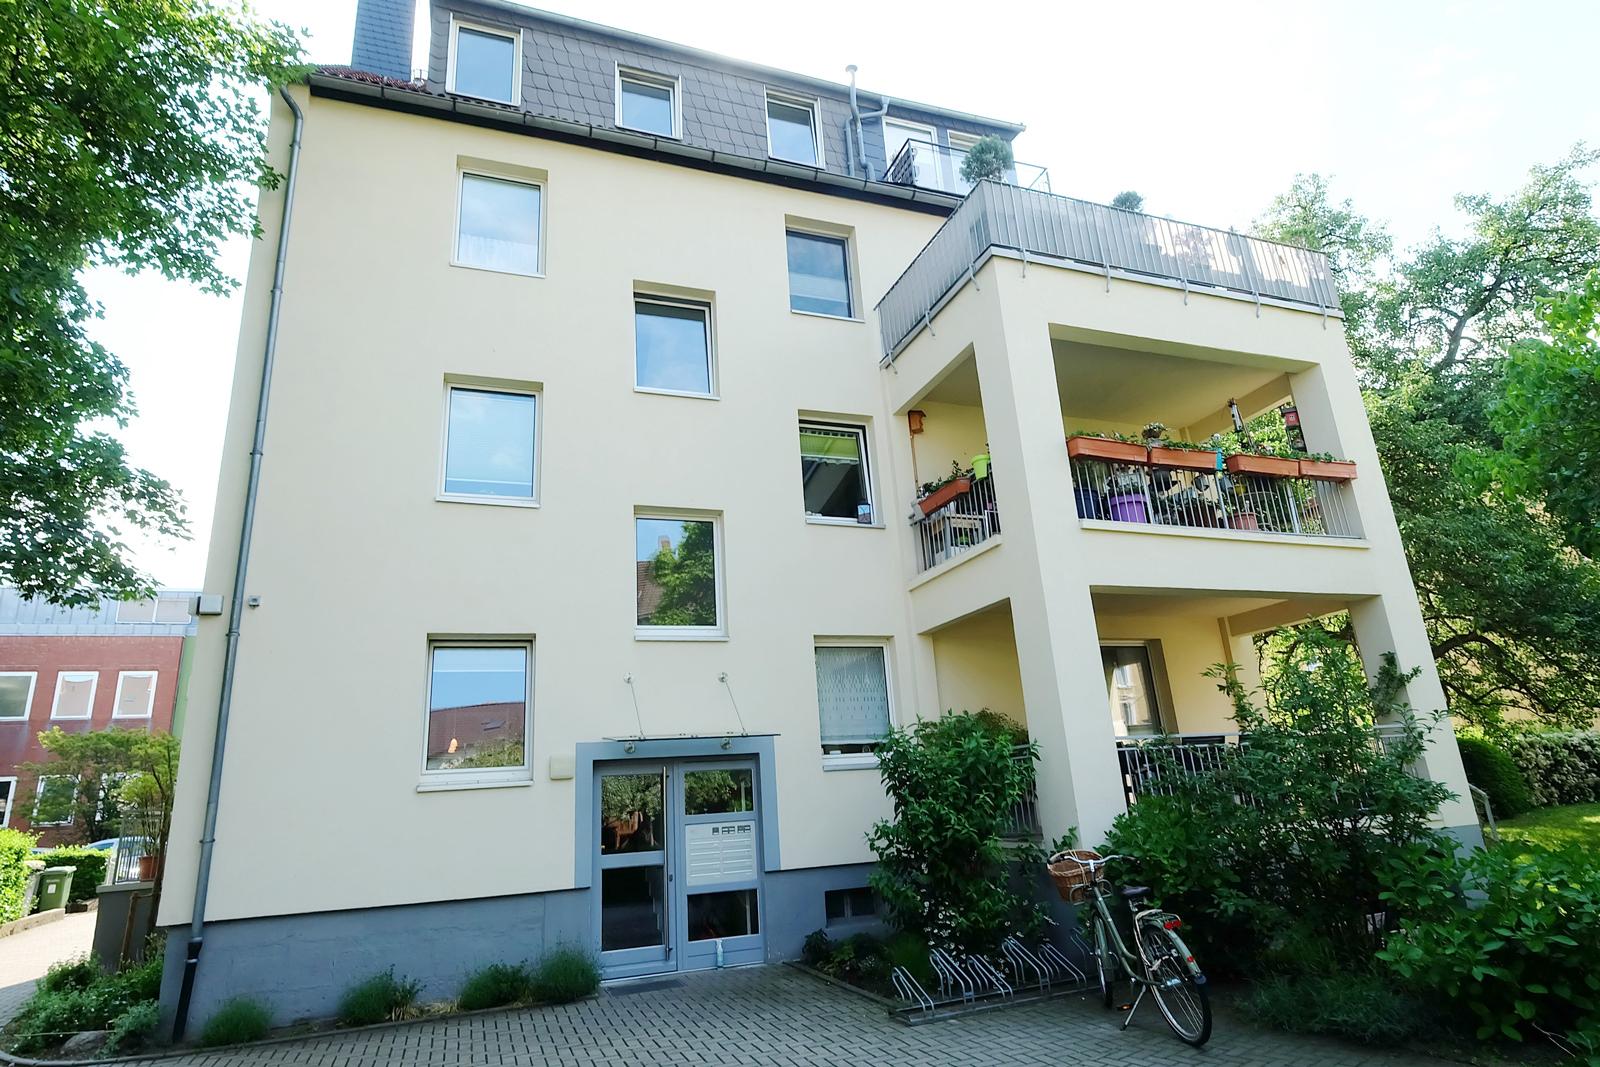 2-Zimmer-Dachgeschosswohnung, Braunschweig-Innenstadt